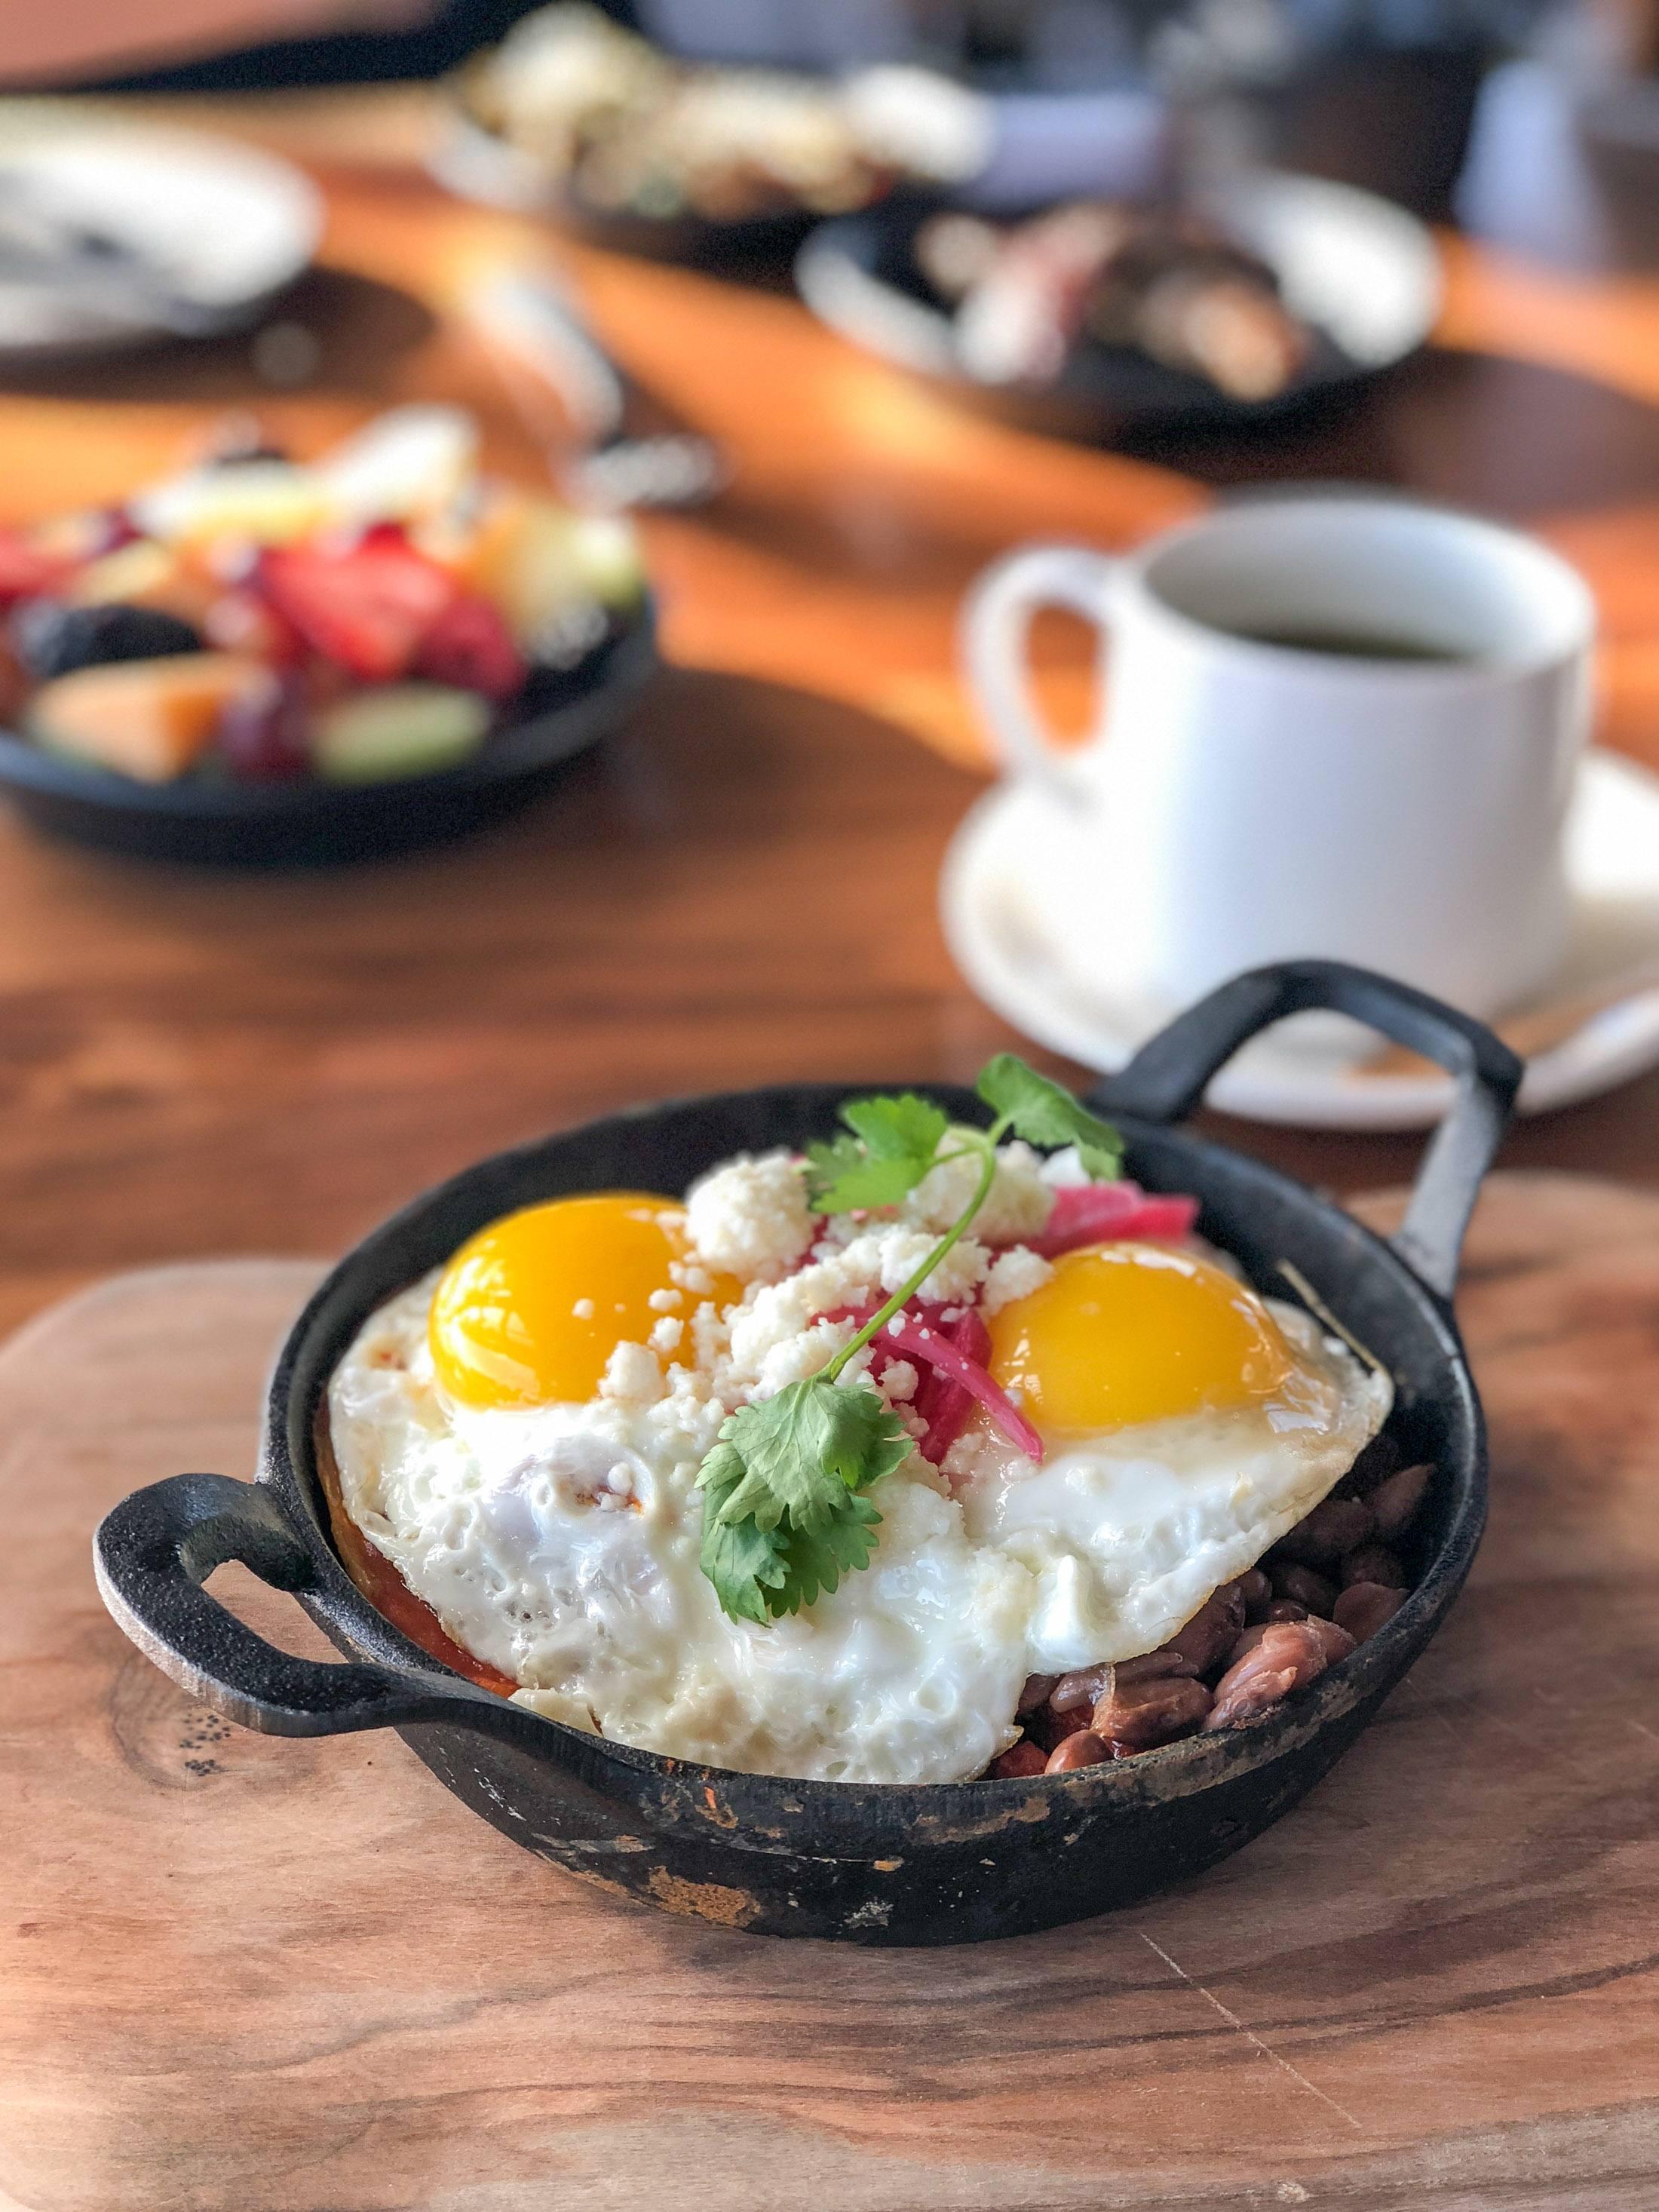 Huevos Rancheros at Hotel Chaco in Albuquerque for breakfast.